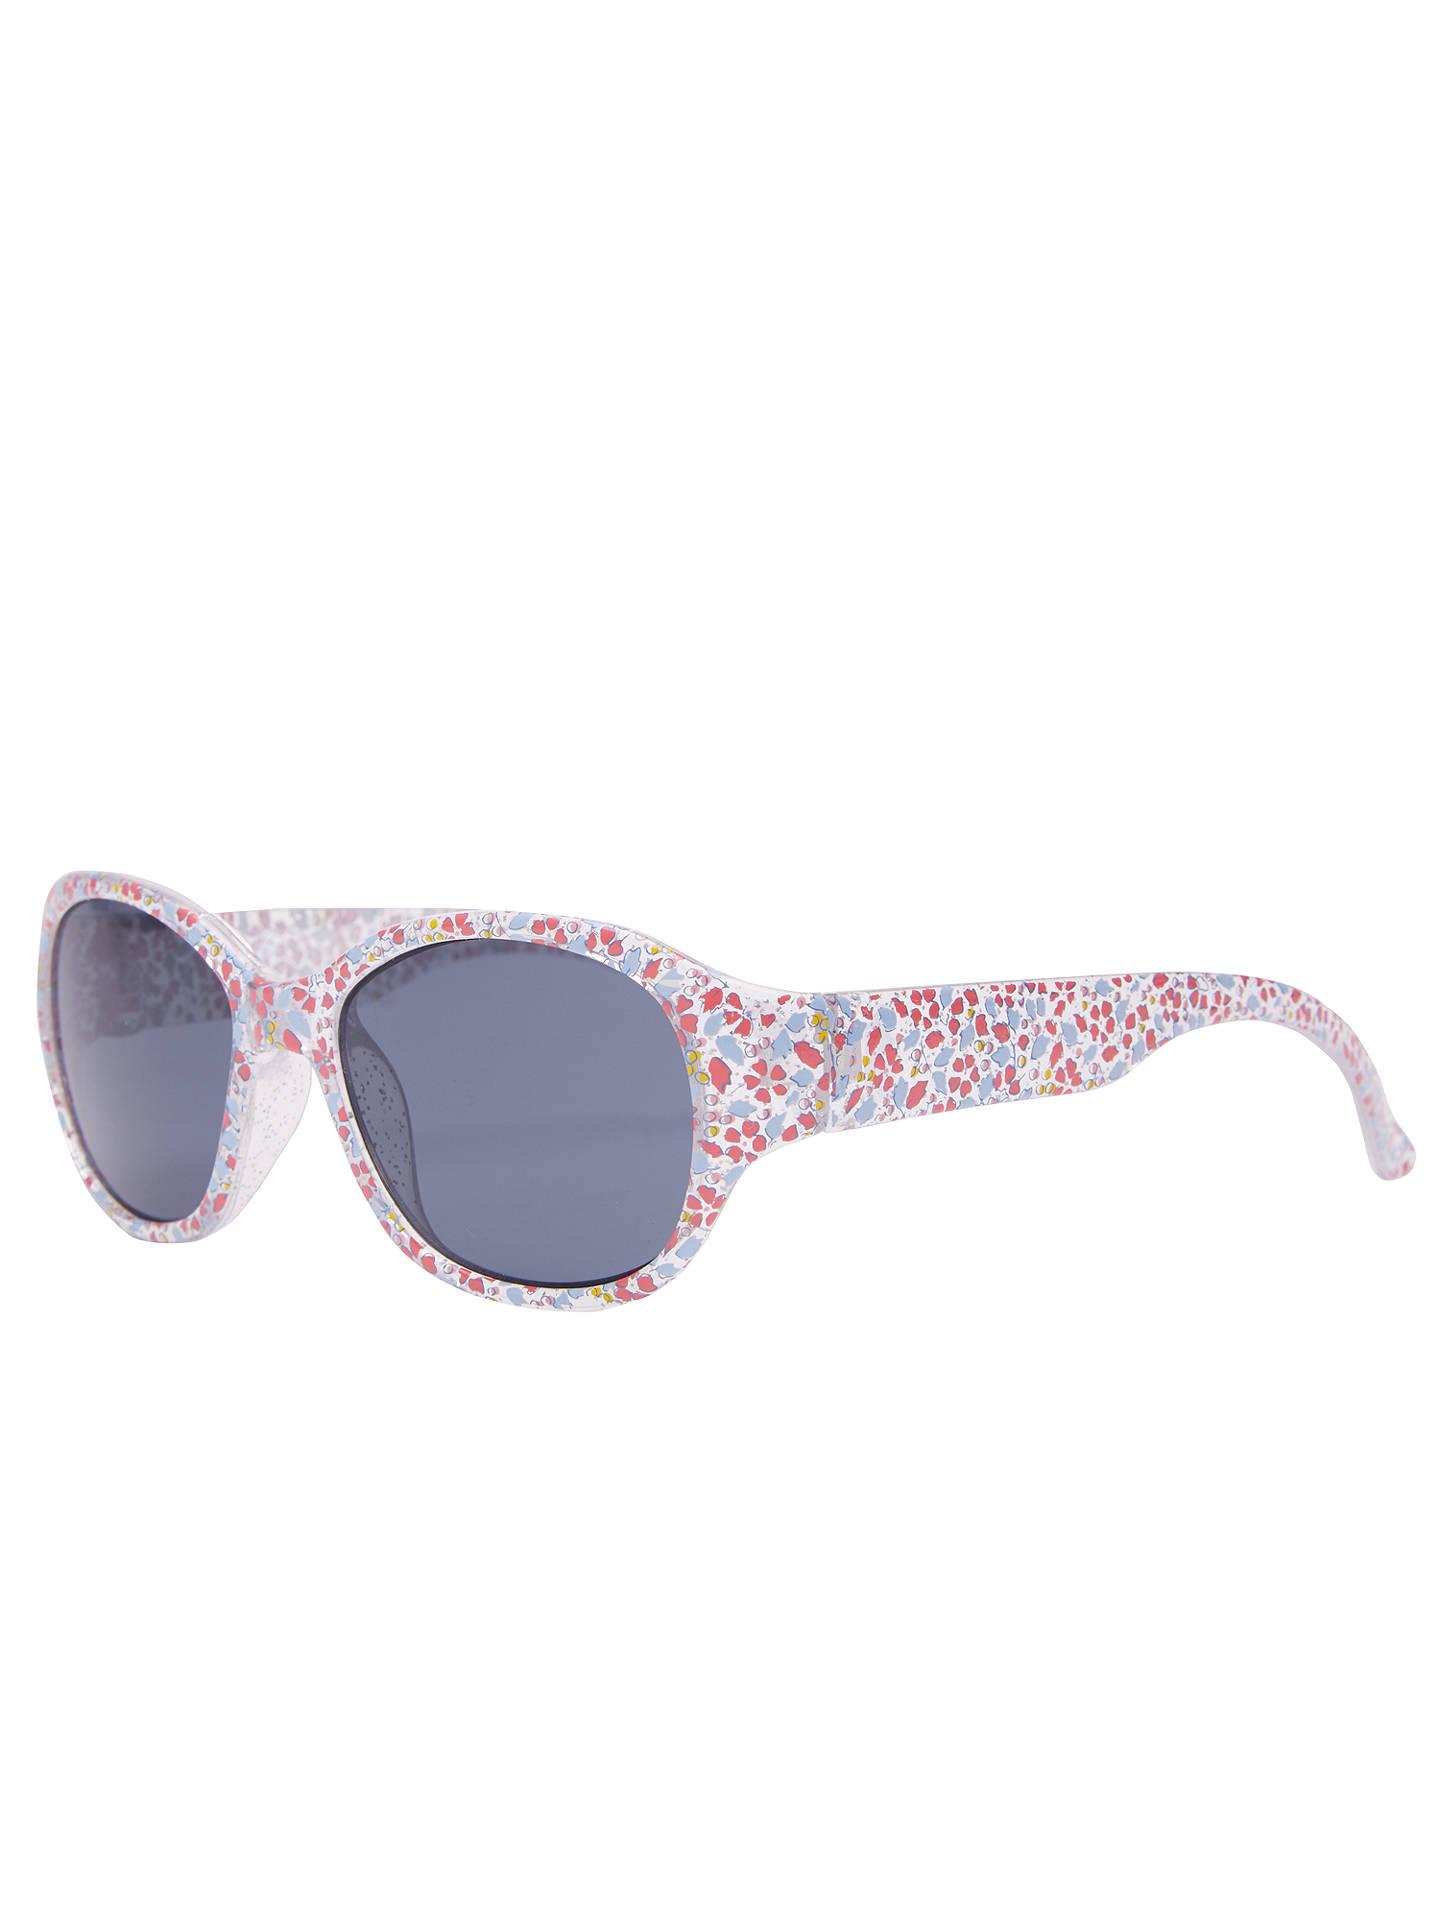 eb1a4f88a3555 Buy John Lewis Children s Pretty Floral Sunglasses